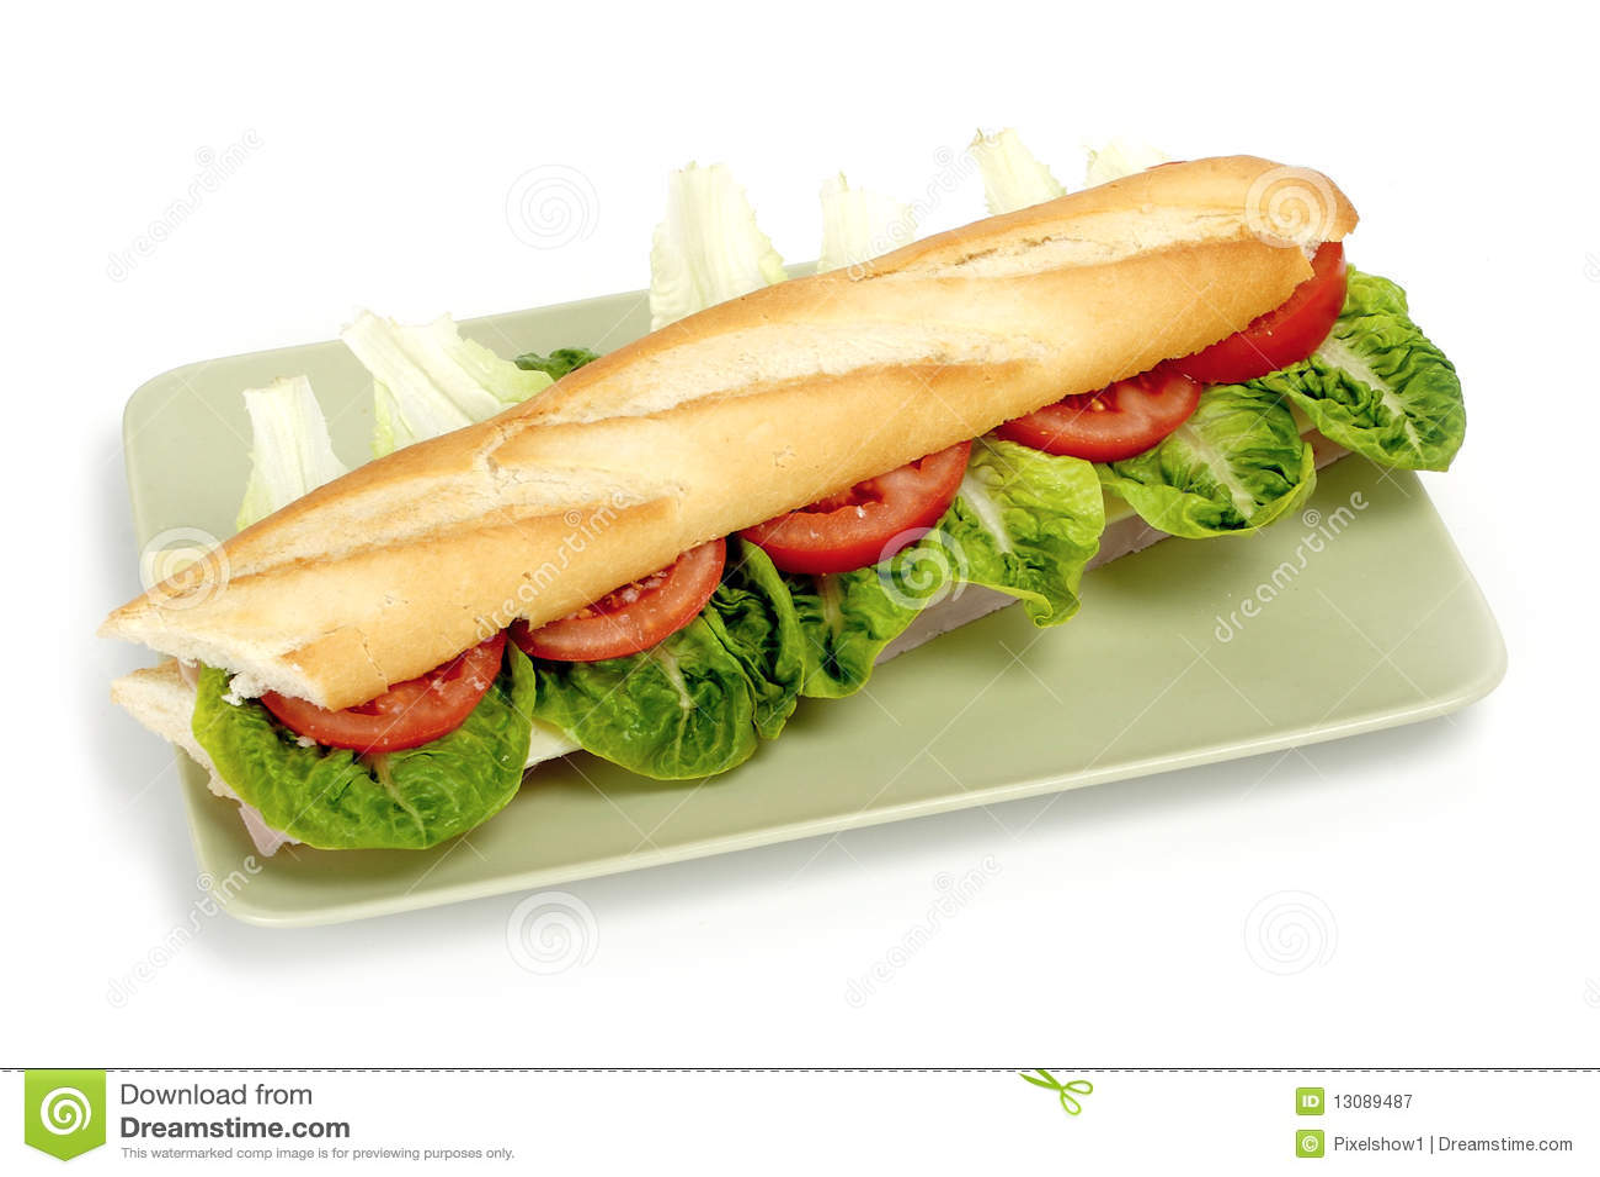 half of long baguette sandwich royalty free stock